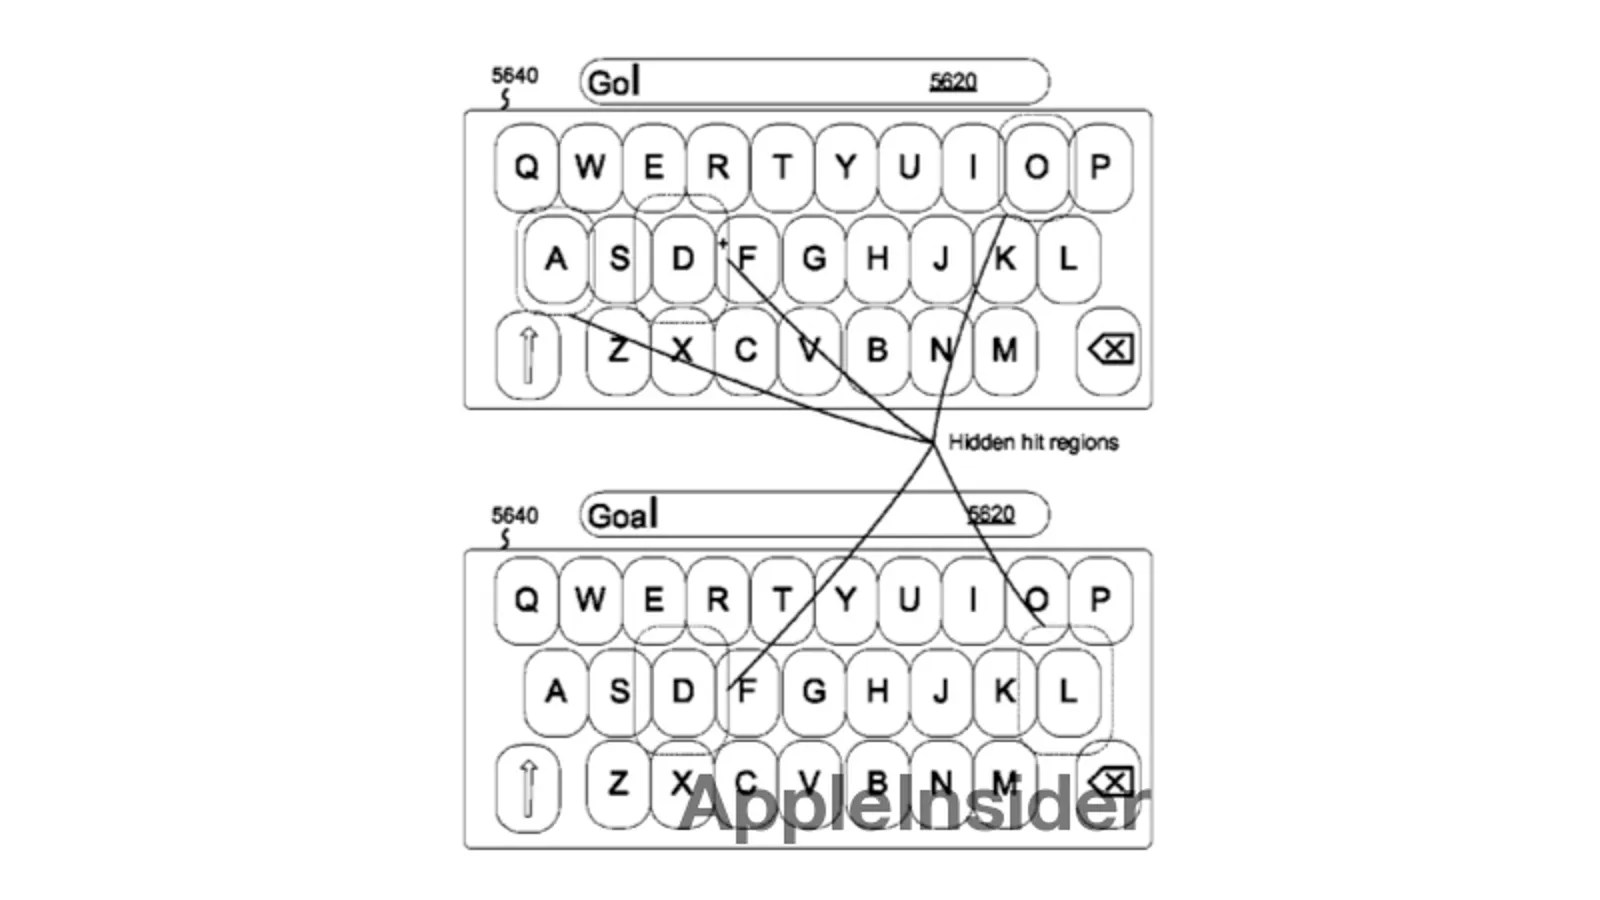 The iPhone's Future Predictive Keyboard Makes Certain Keys